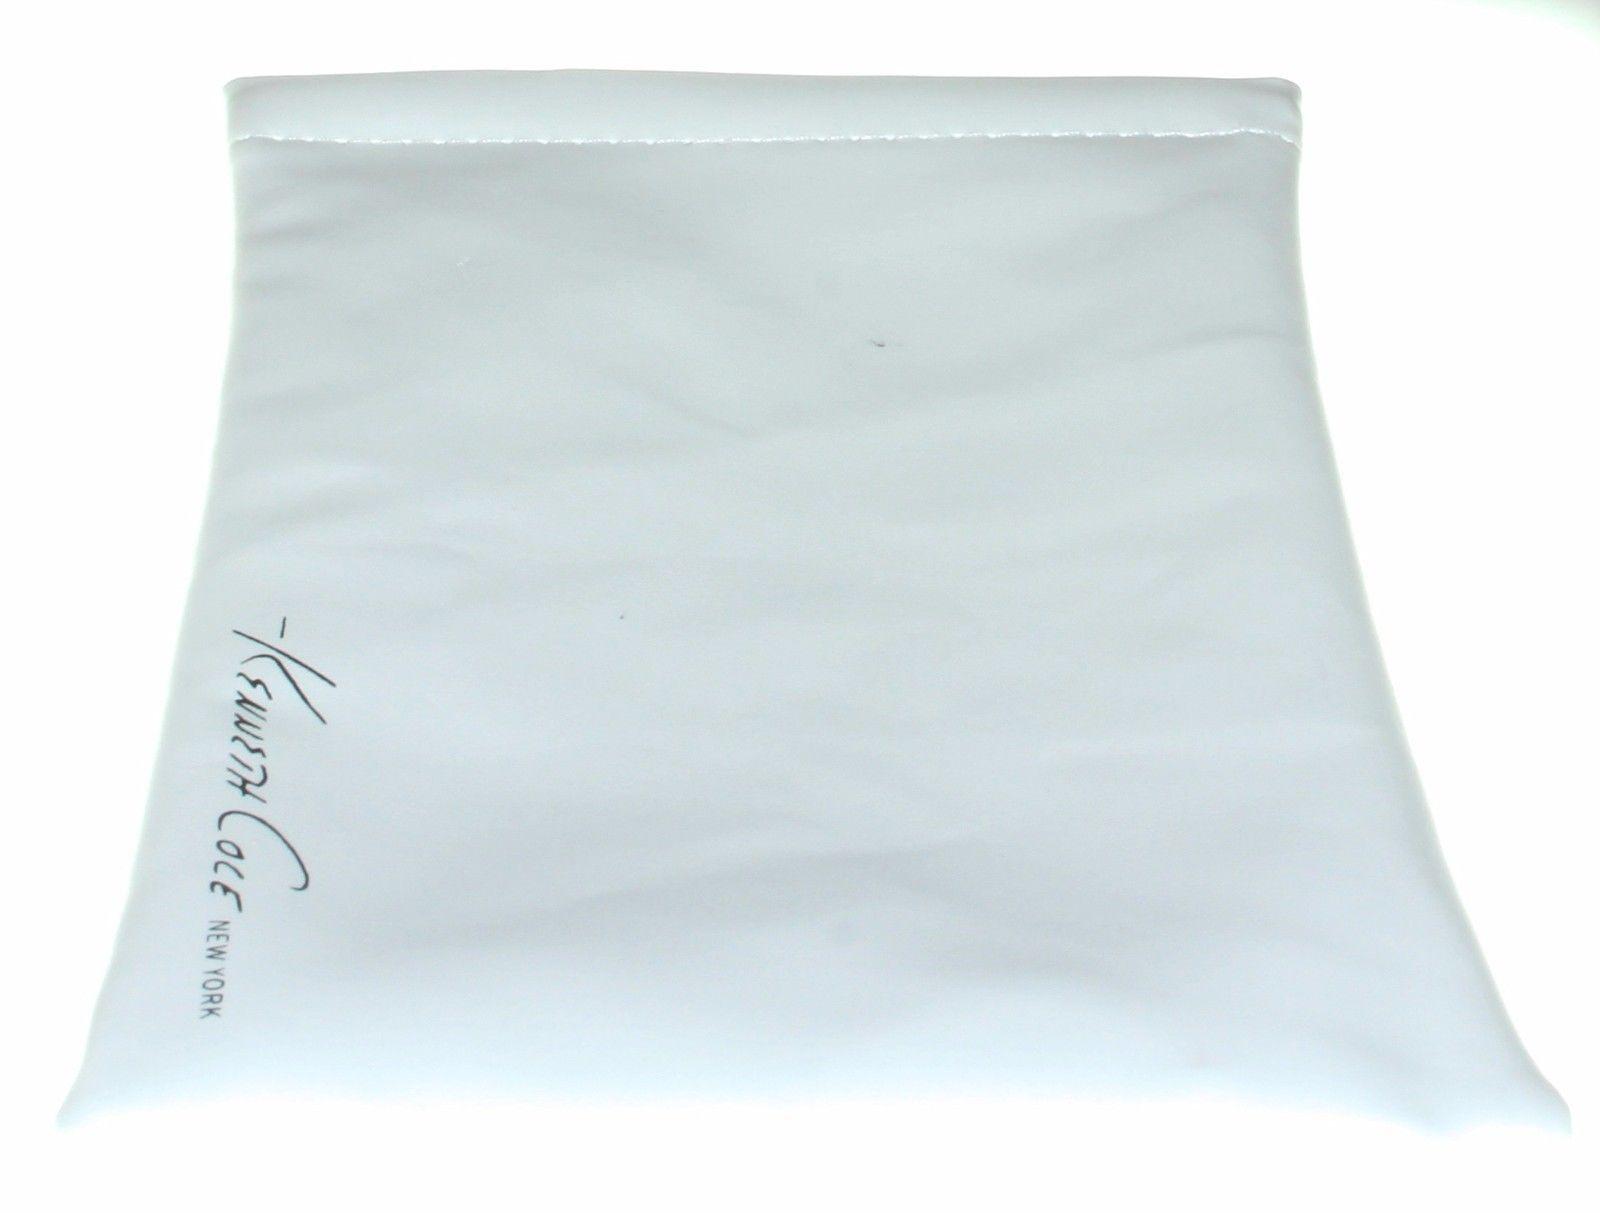 Kenneth Cole New York Mens Sunglass Soft Square Black, Smoke Lens KC7034 1B image 6